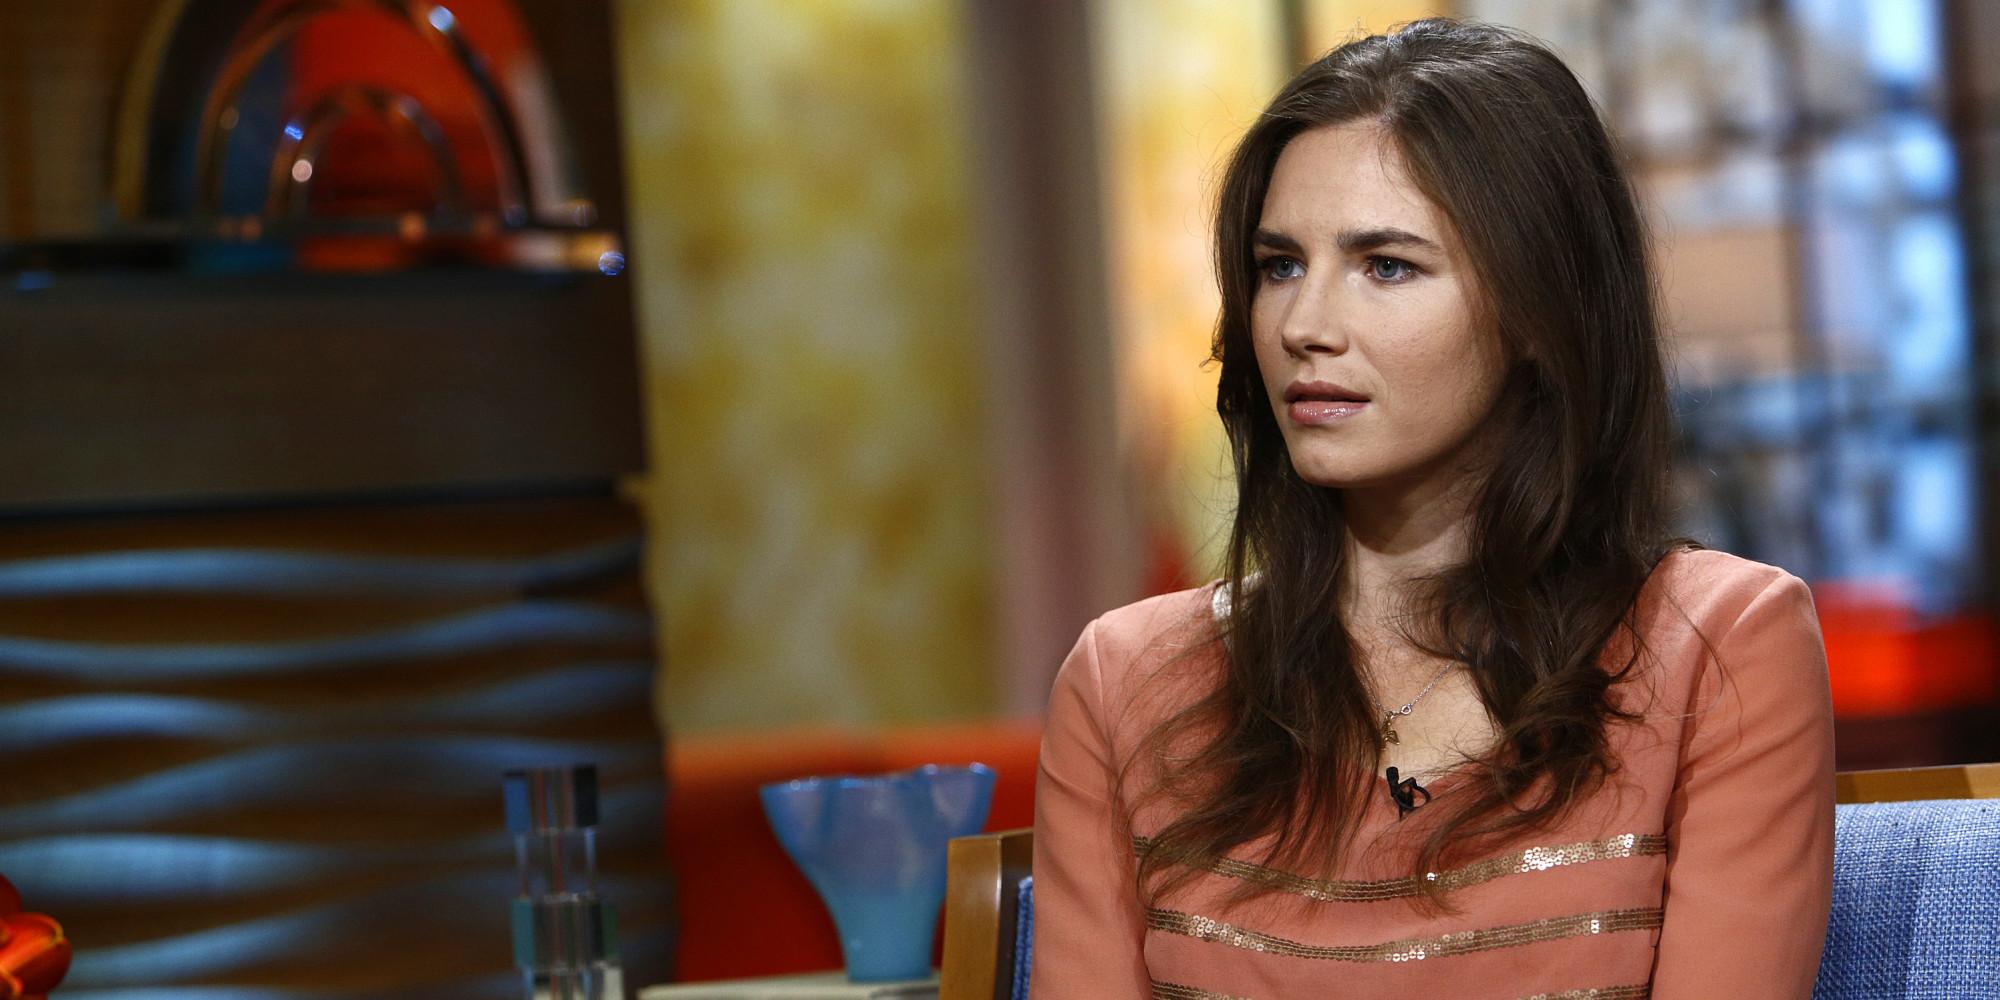 Amanda Knox ITV Daybreak Interview: 'I Have Plenty To Fear' In Italy ...